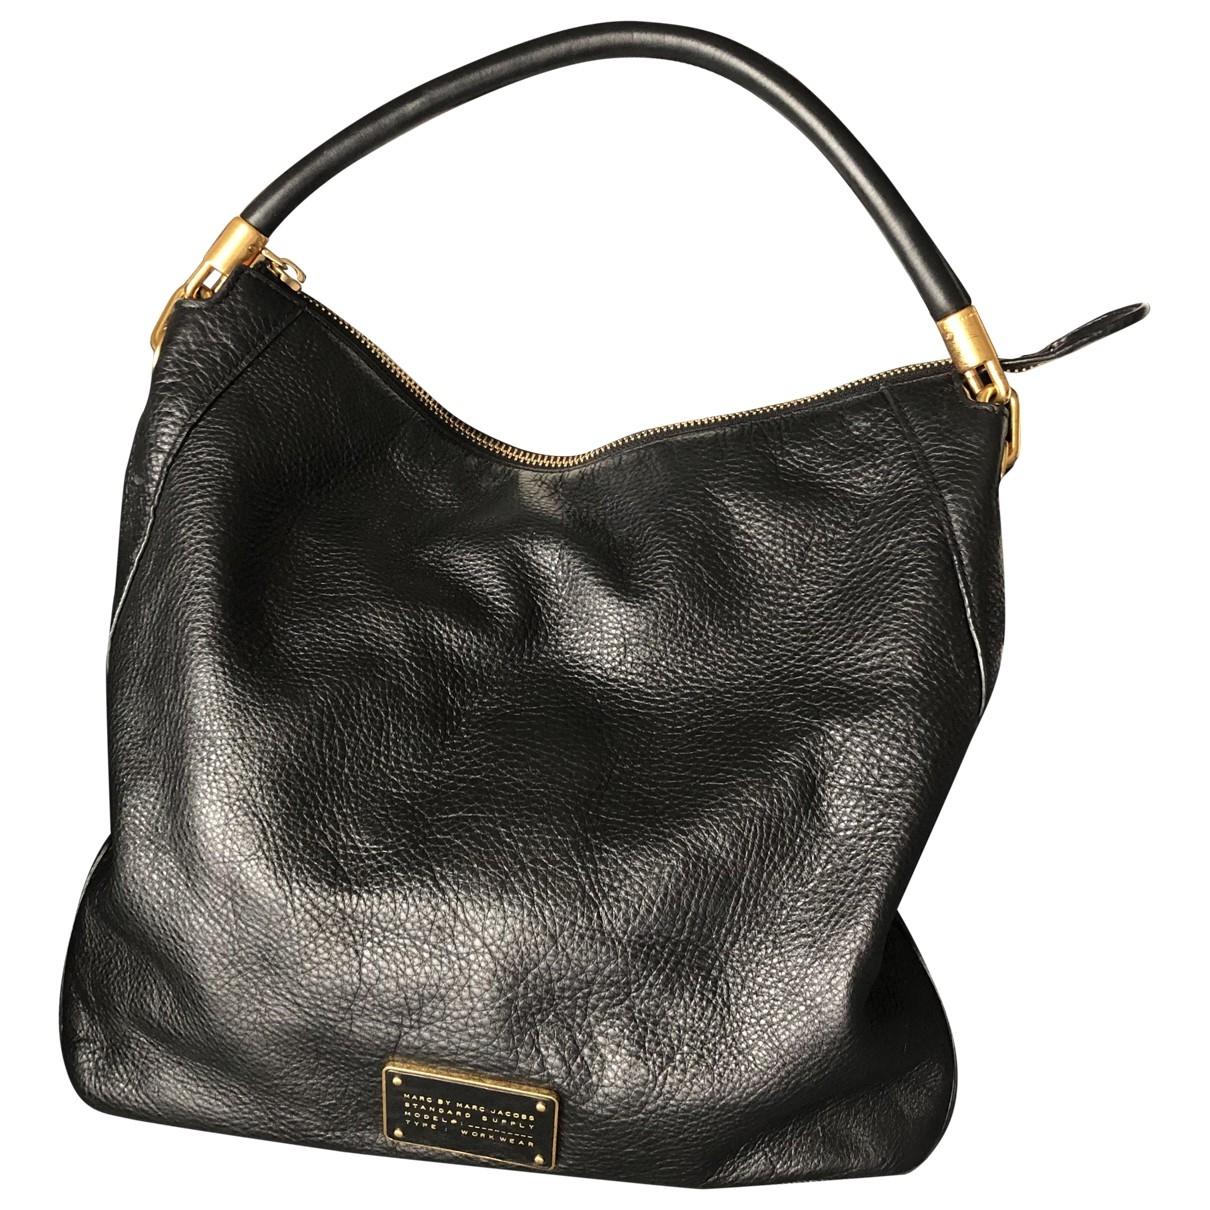 Marc By Marc Jacobs \N Black Leather handbag for Women \N